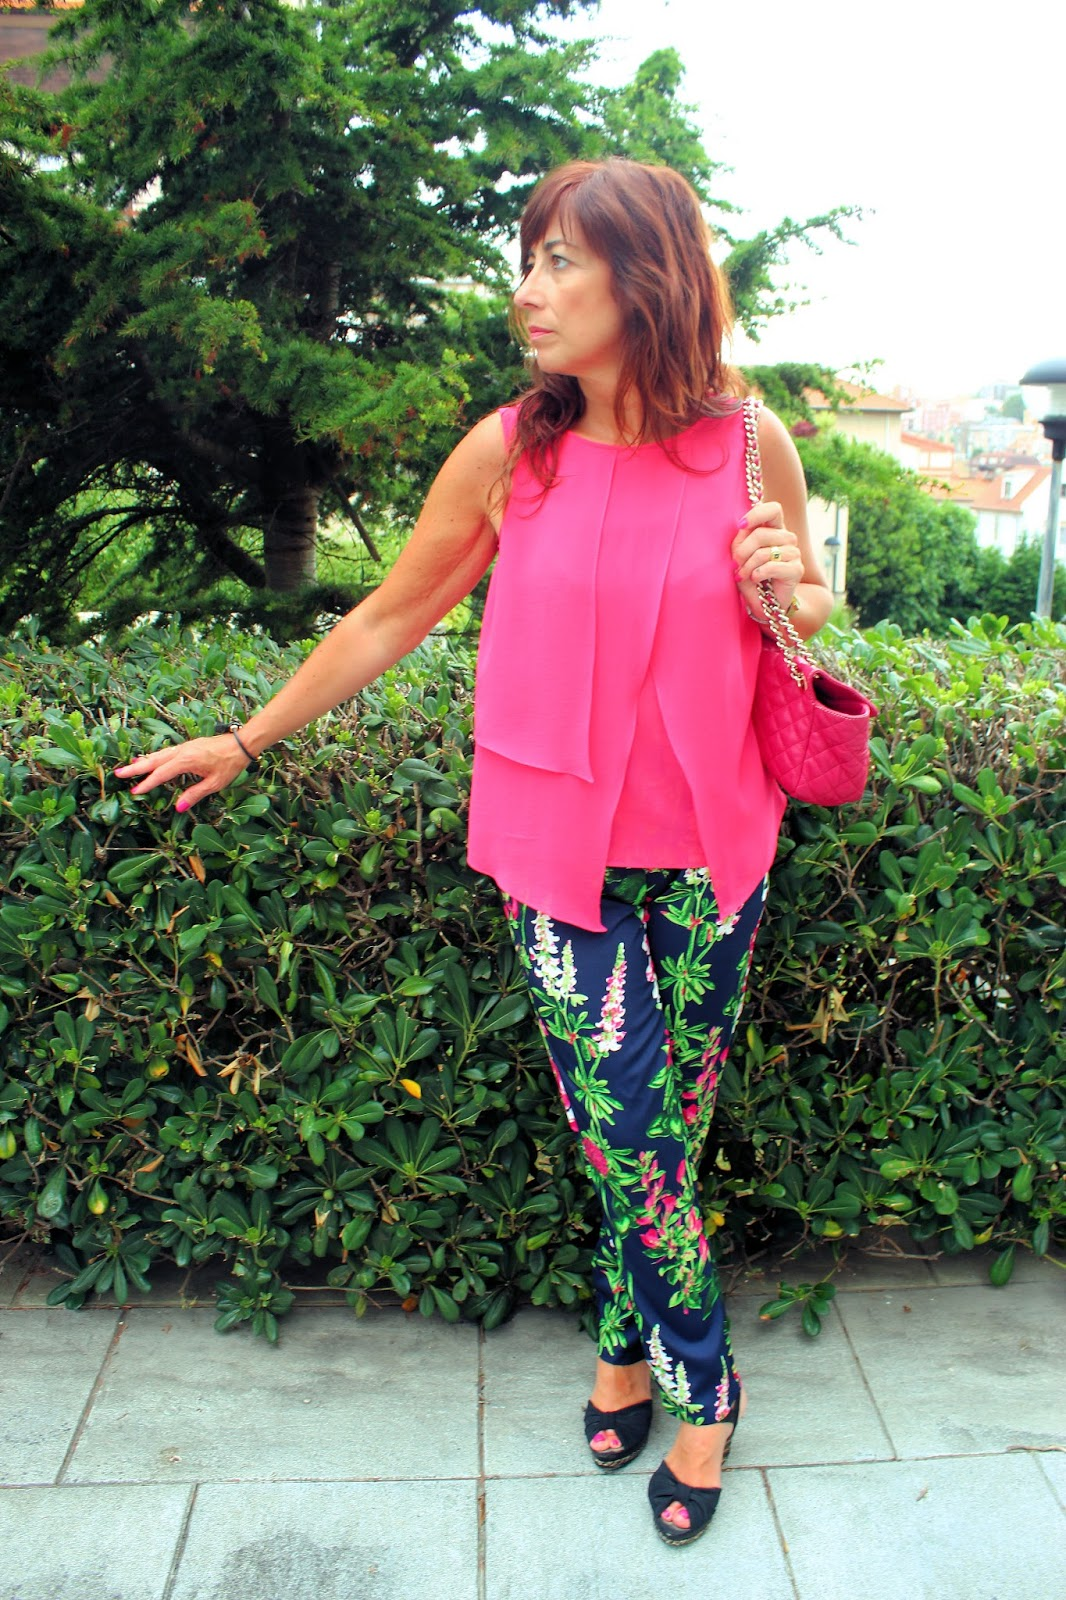 Br jula de estilo mis looks pantal n flores - Brujula de estilo ...